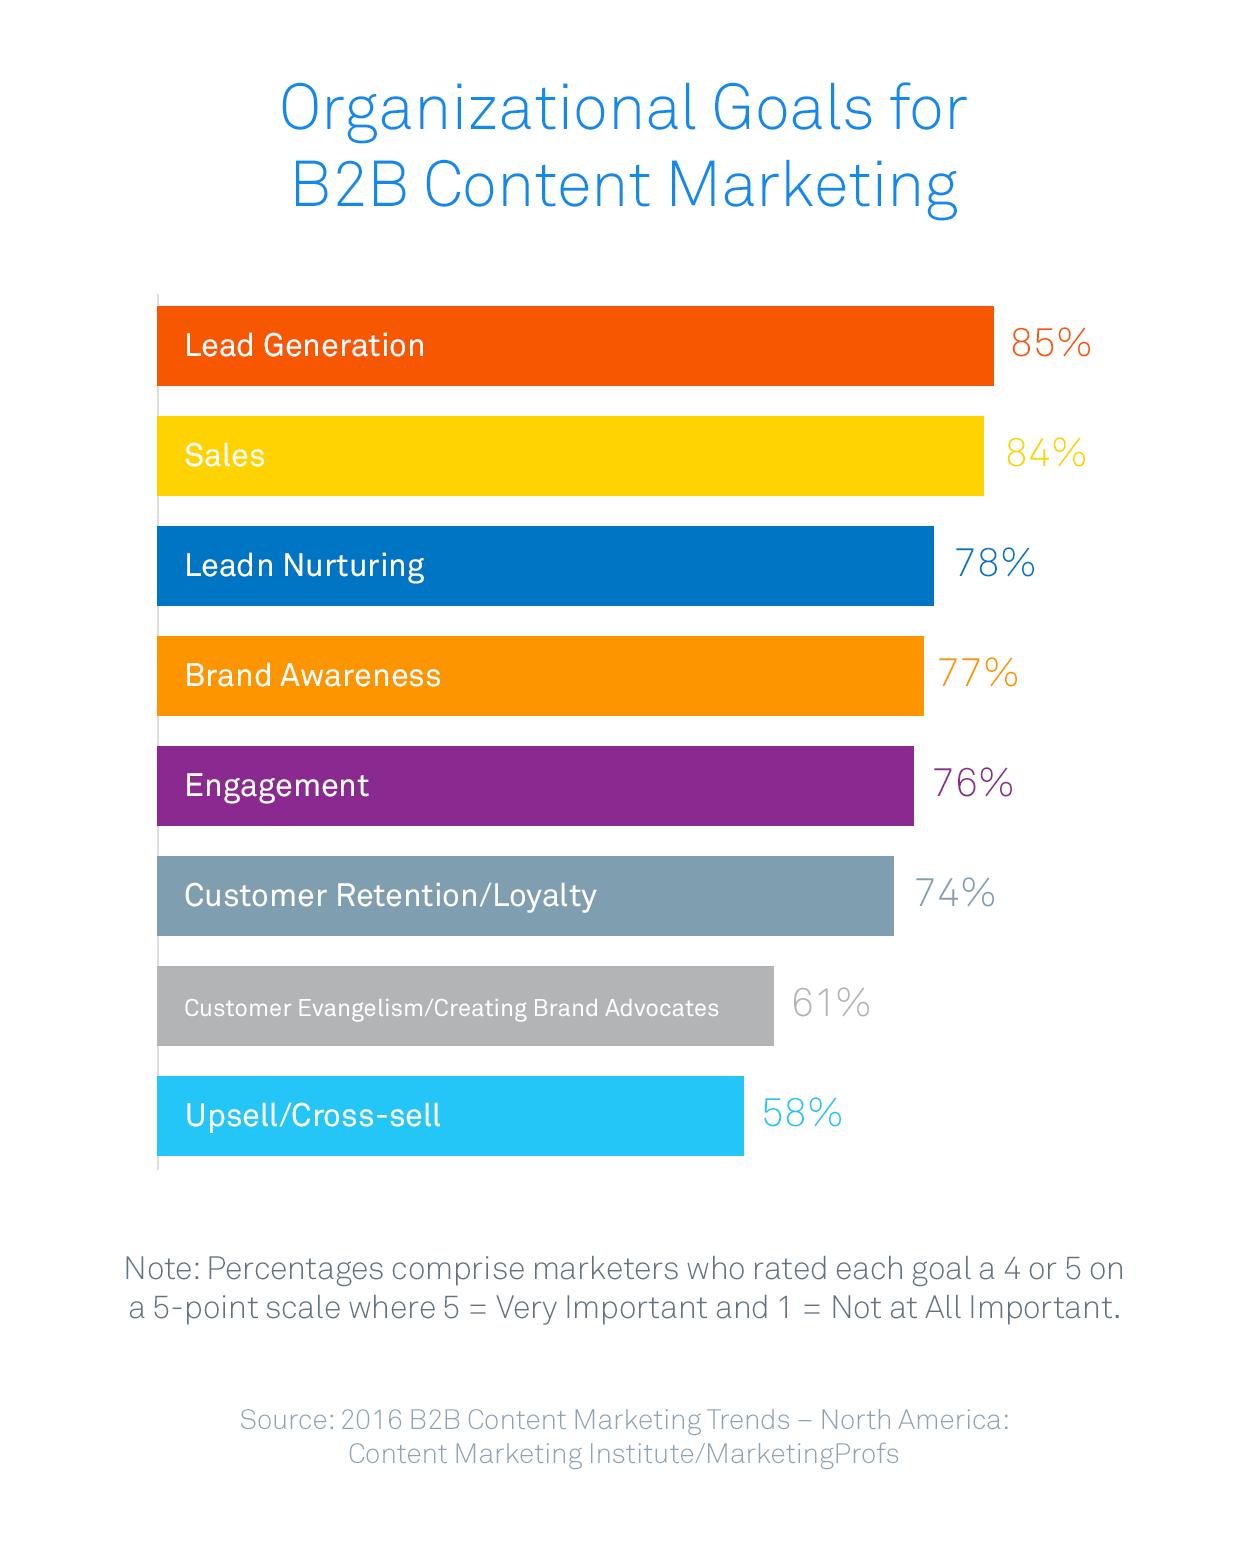 https://intercom.com/blog/wp-content/uploads/2015/11/organizational_goals_b2b_marketing.png